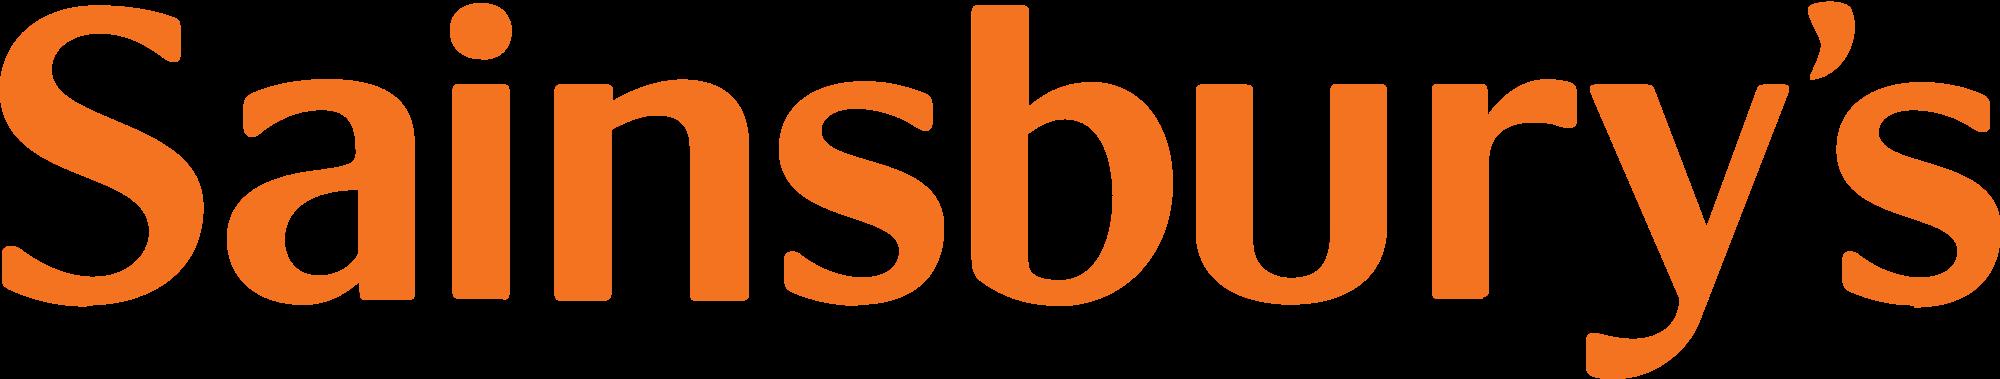 Sainsbury's_Logo_svg